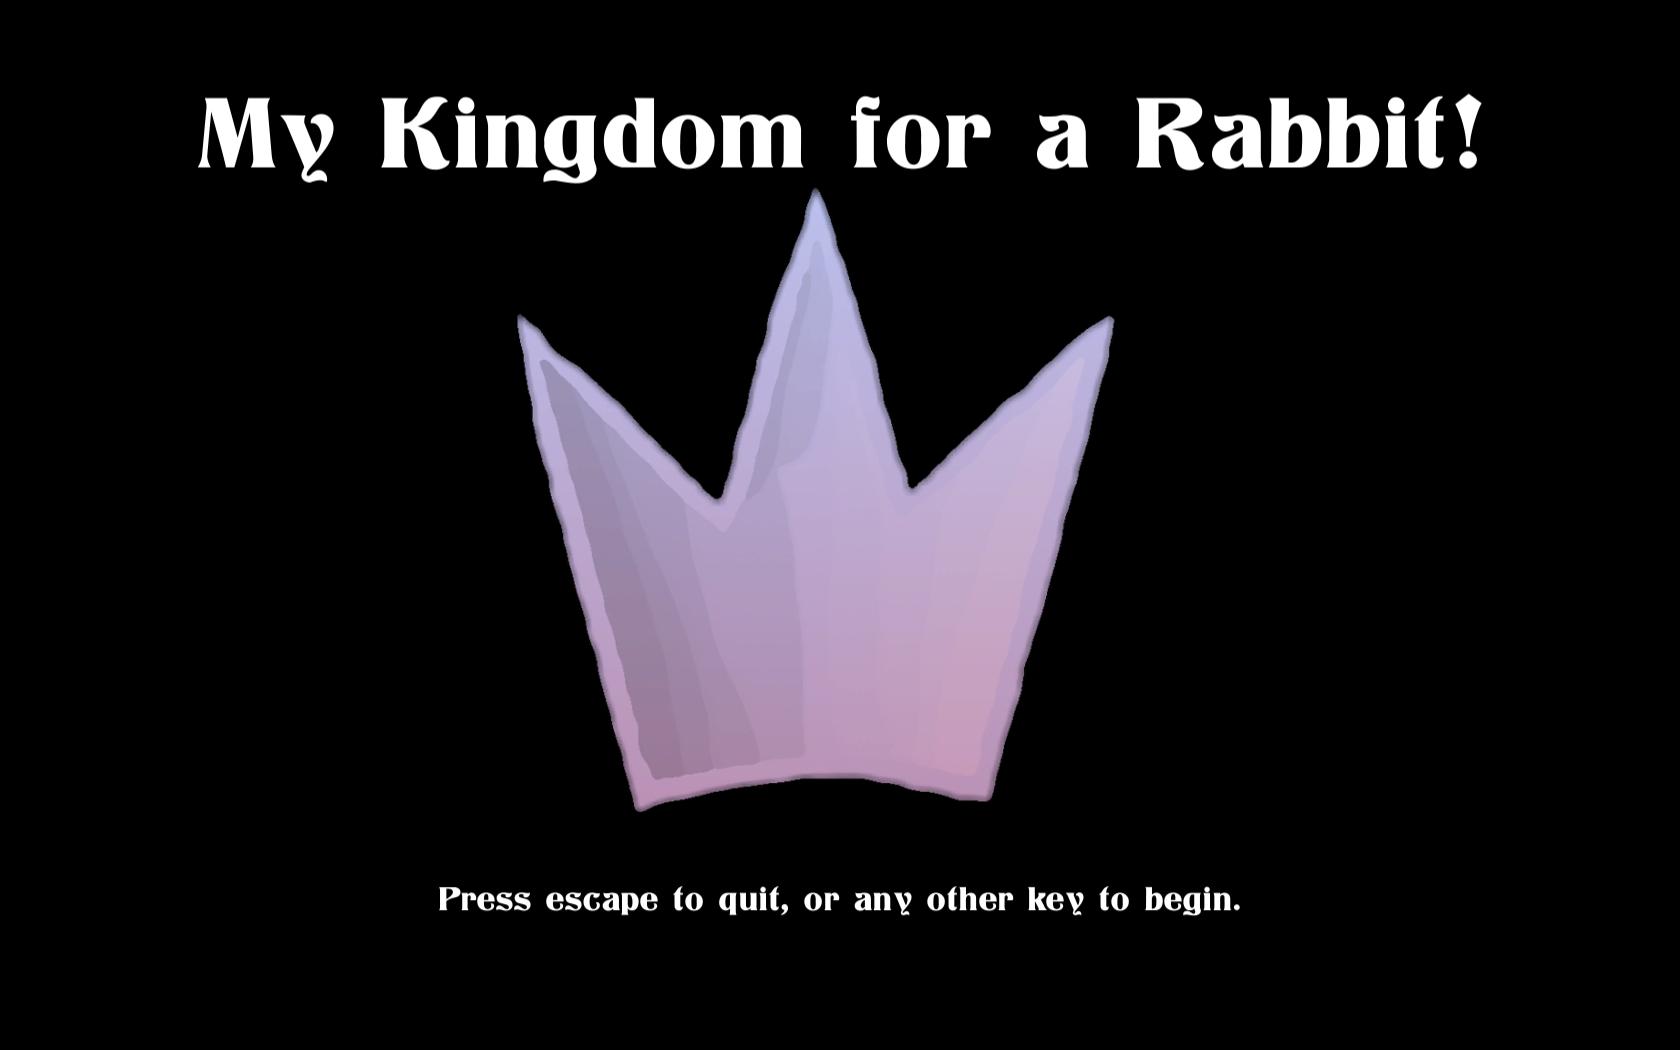 My Kingdom for a Rabbit!